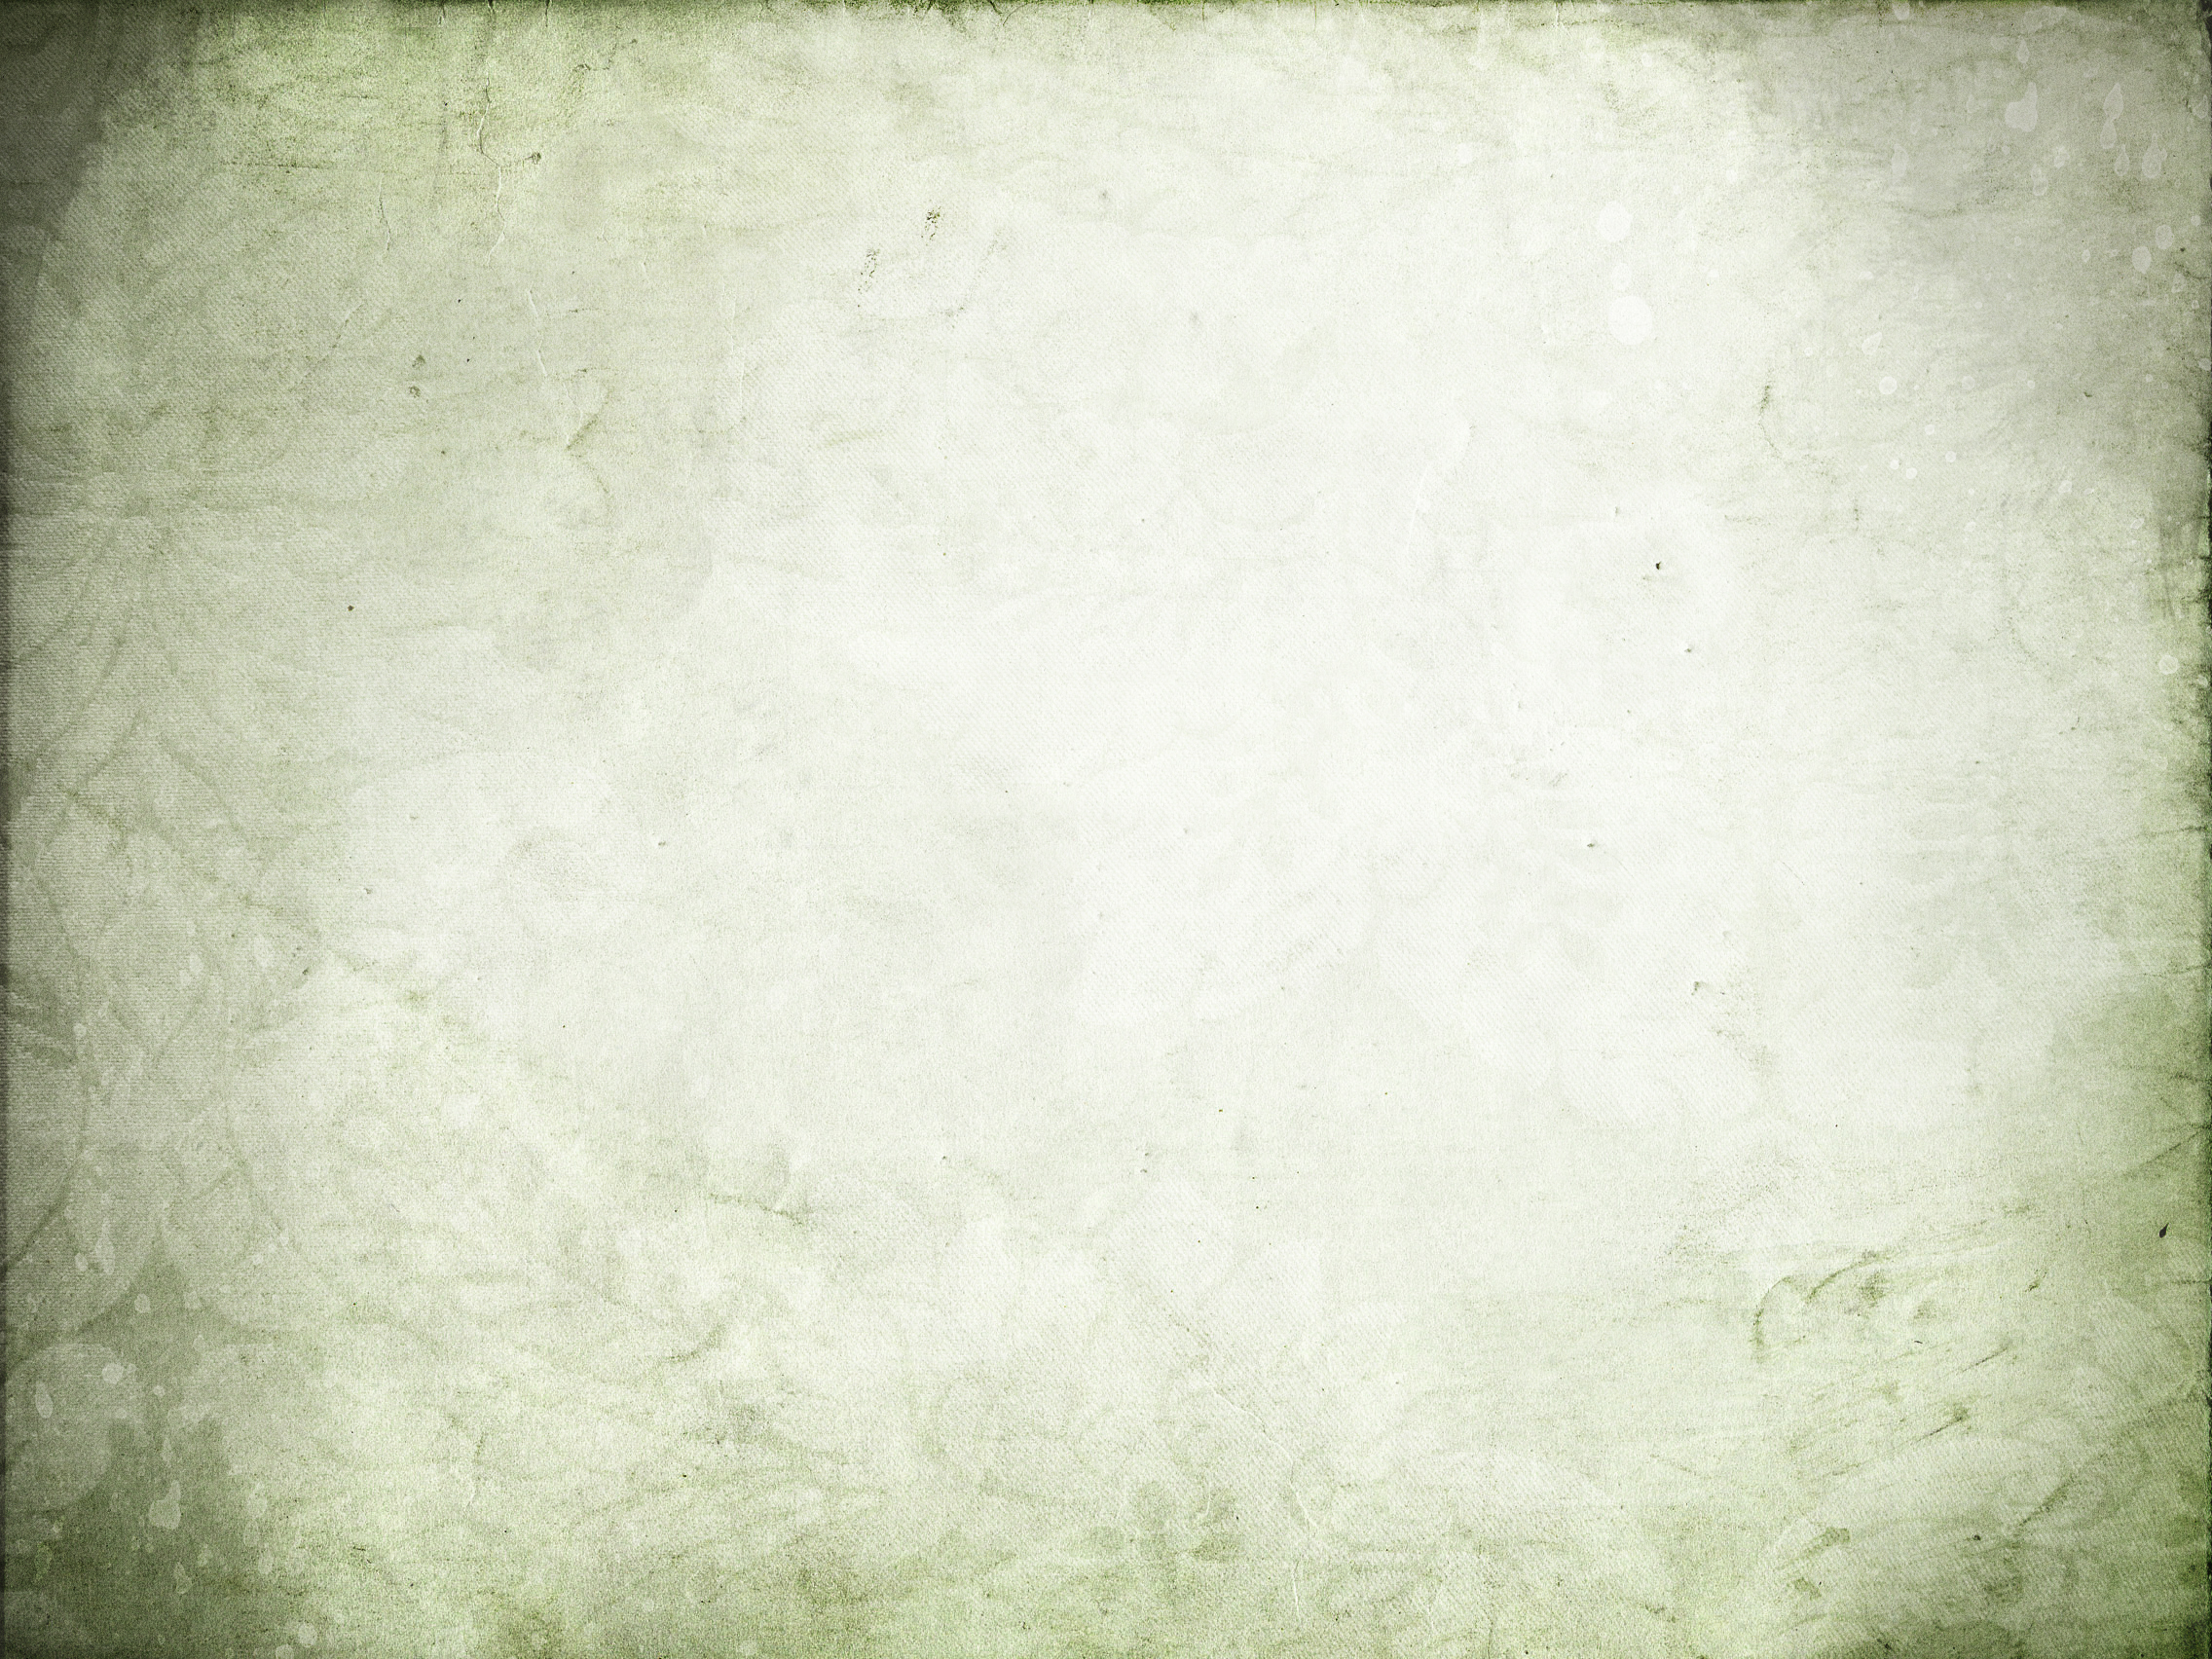 texture on Pinterest | Vintage Grunge, Grunge and Texture